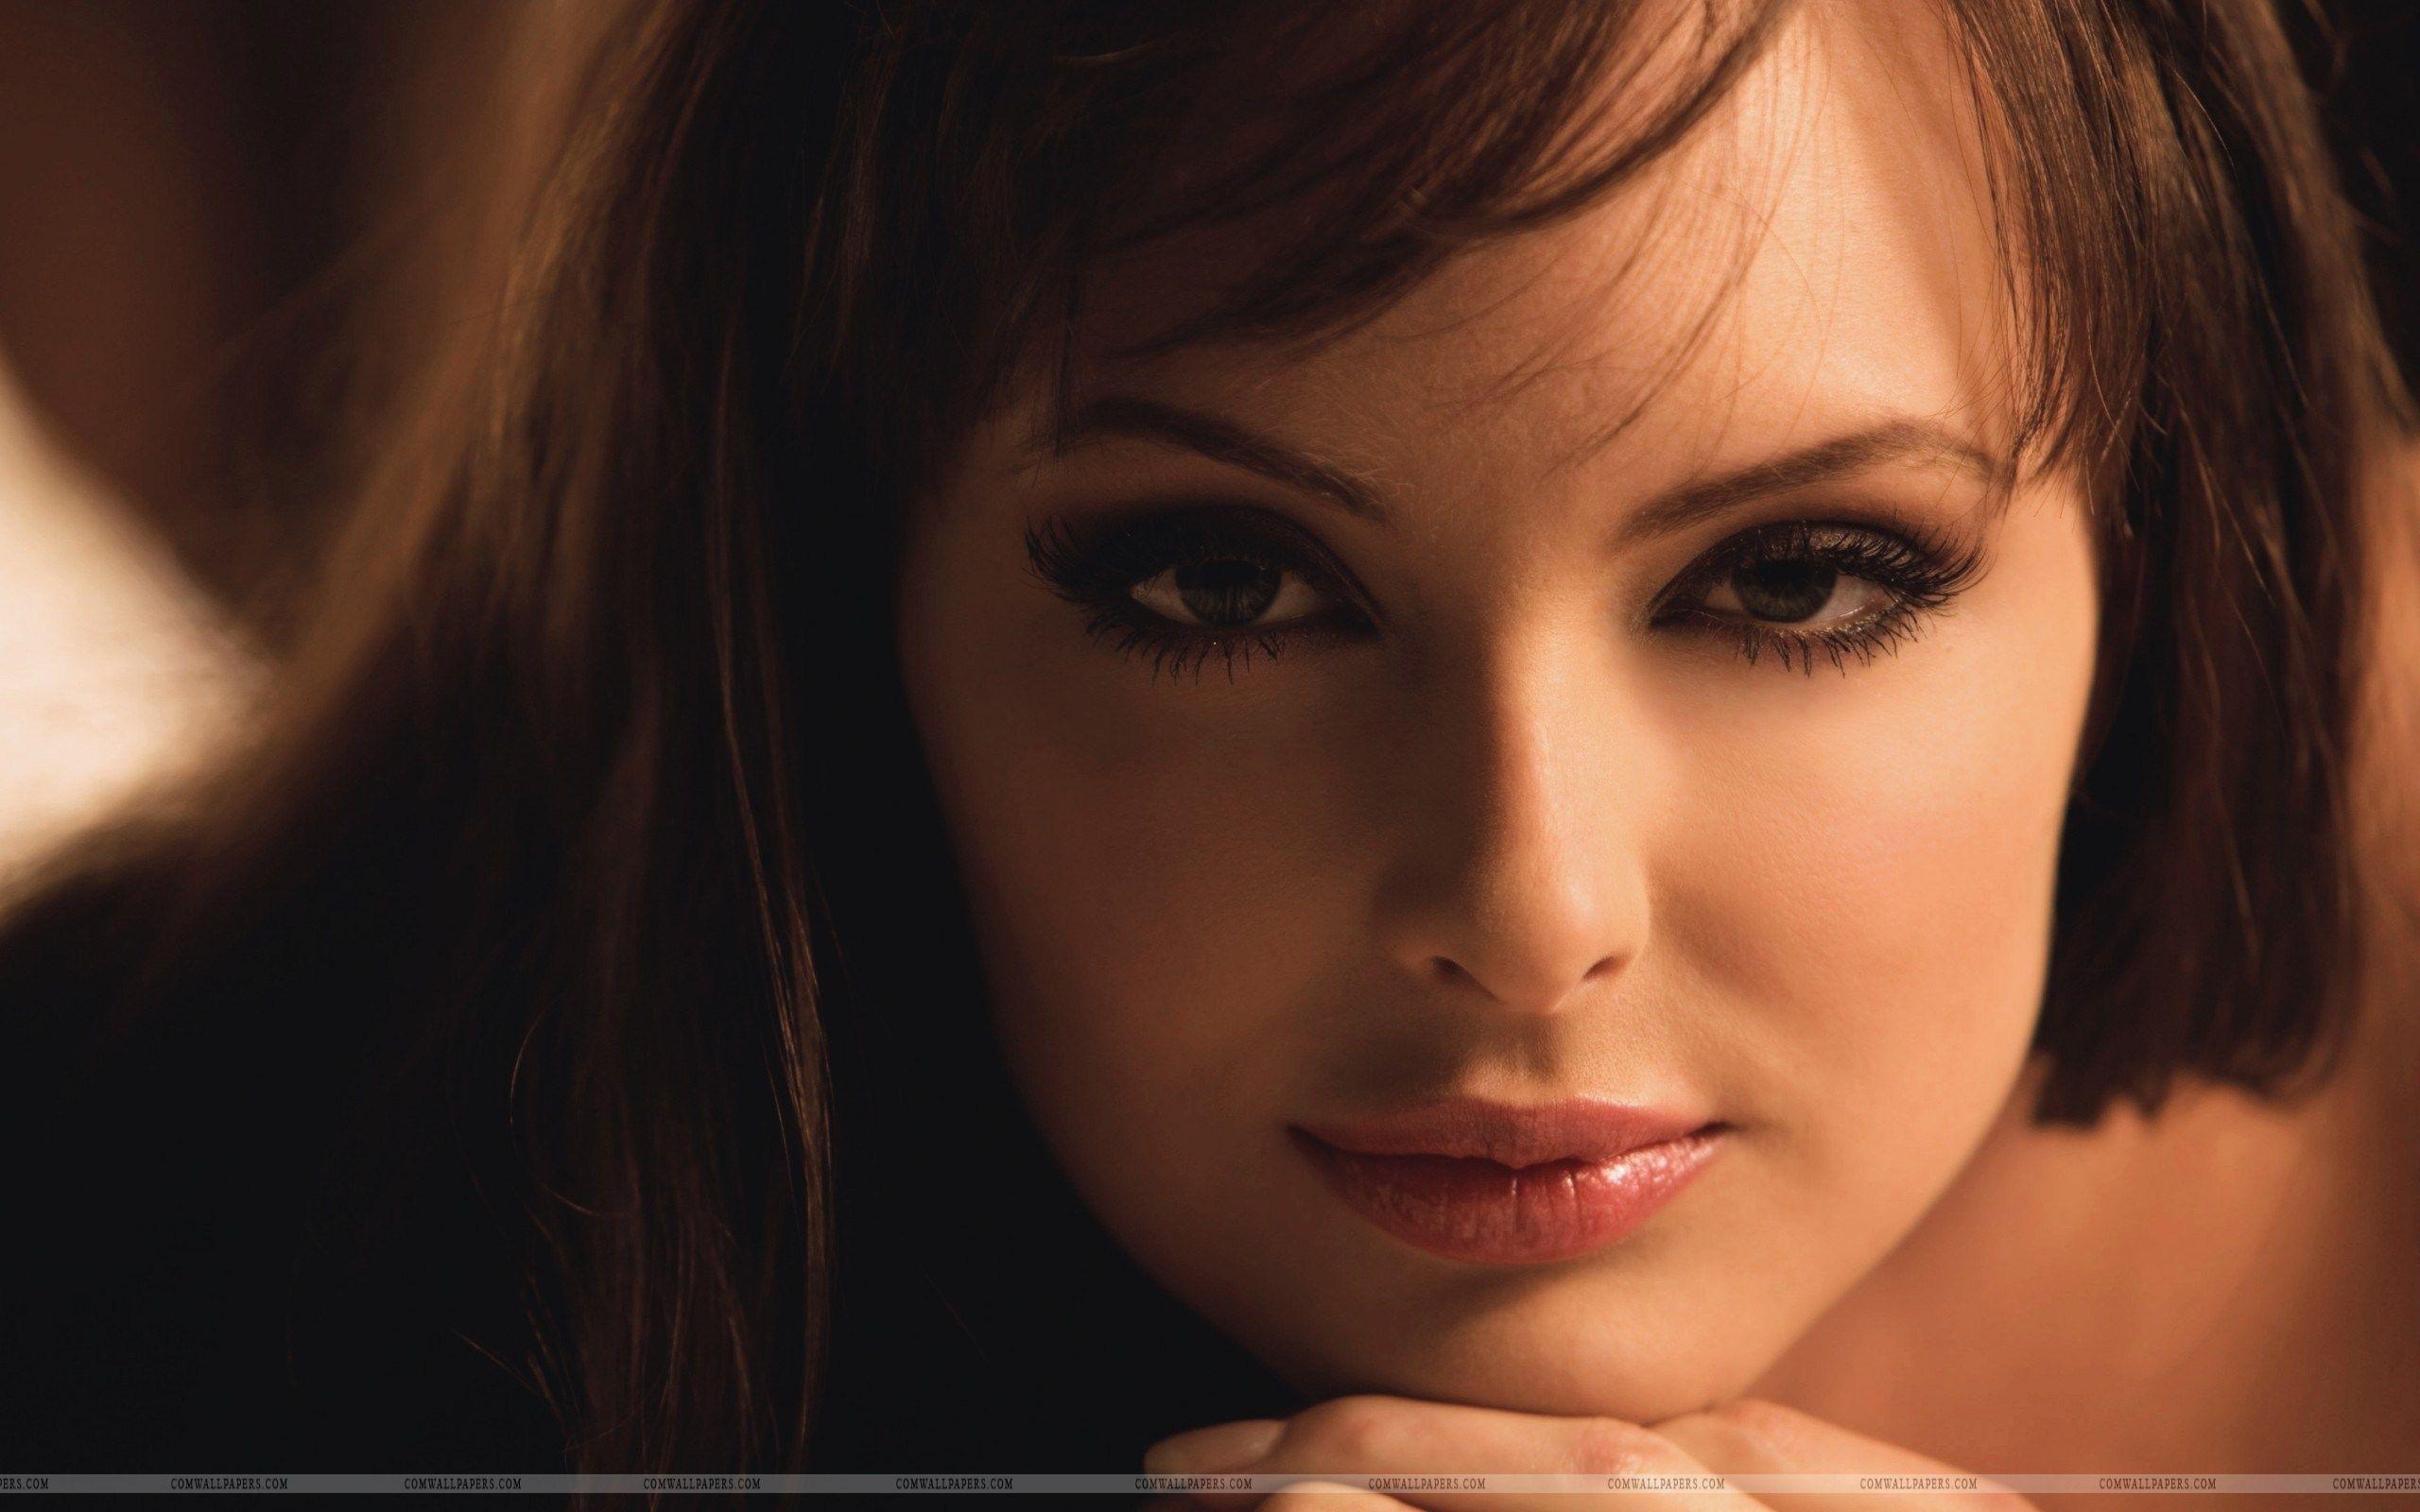 Wallpaper Face Women Cosplay Model Simple Background: Beautiful Face Woman Hd Wallpaper